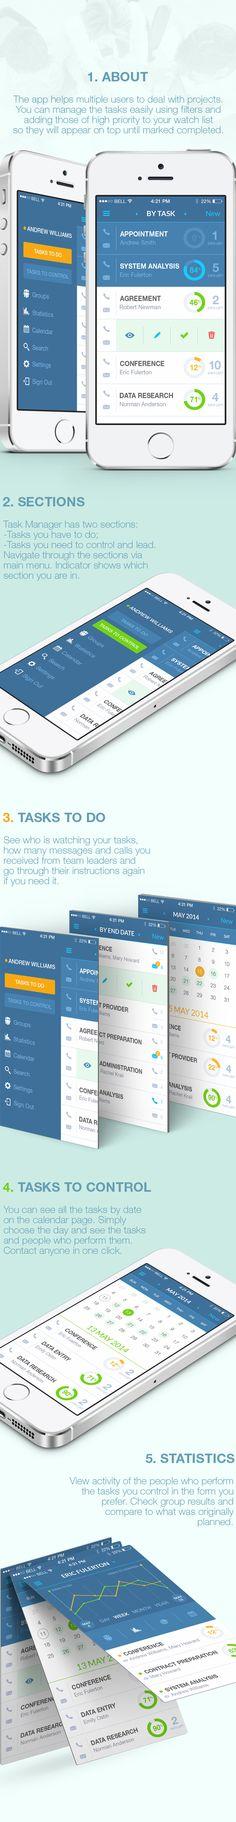 Task Manager App by Southwalk G, via Behance. Beautiful design.